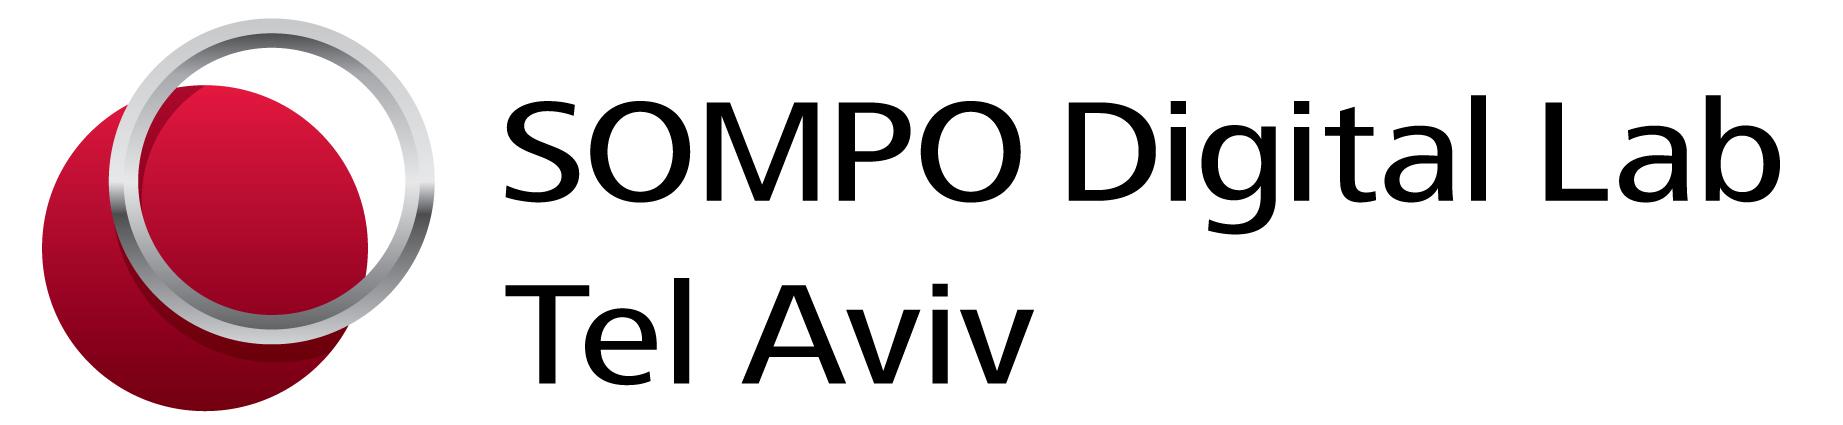 Sompo Digital Lab Israel Ltd